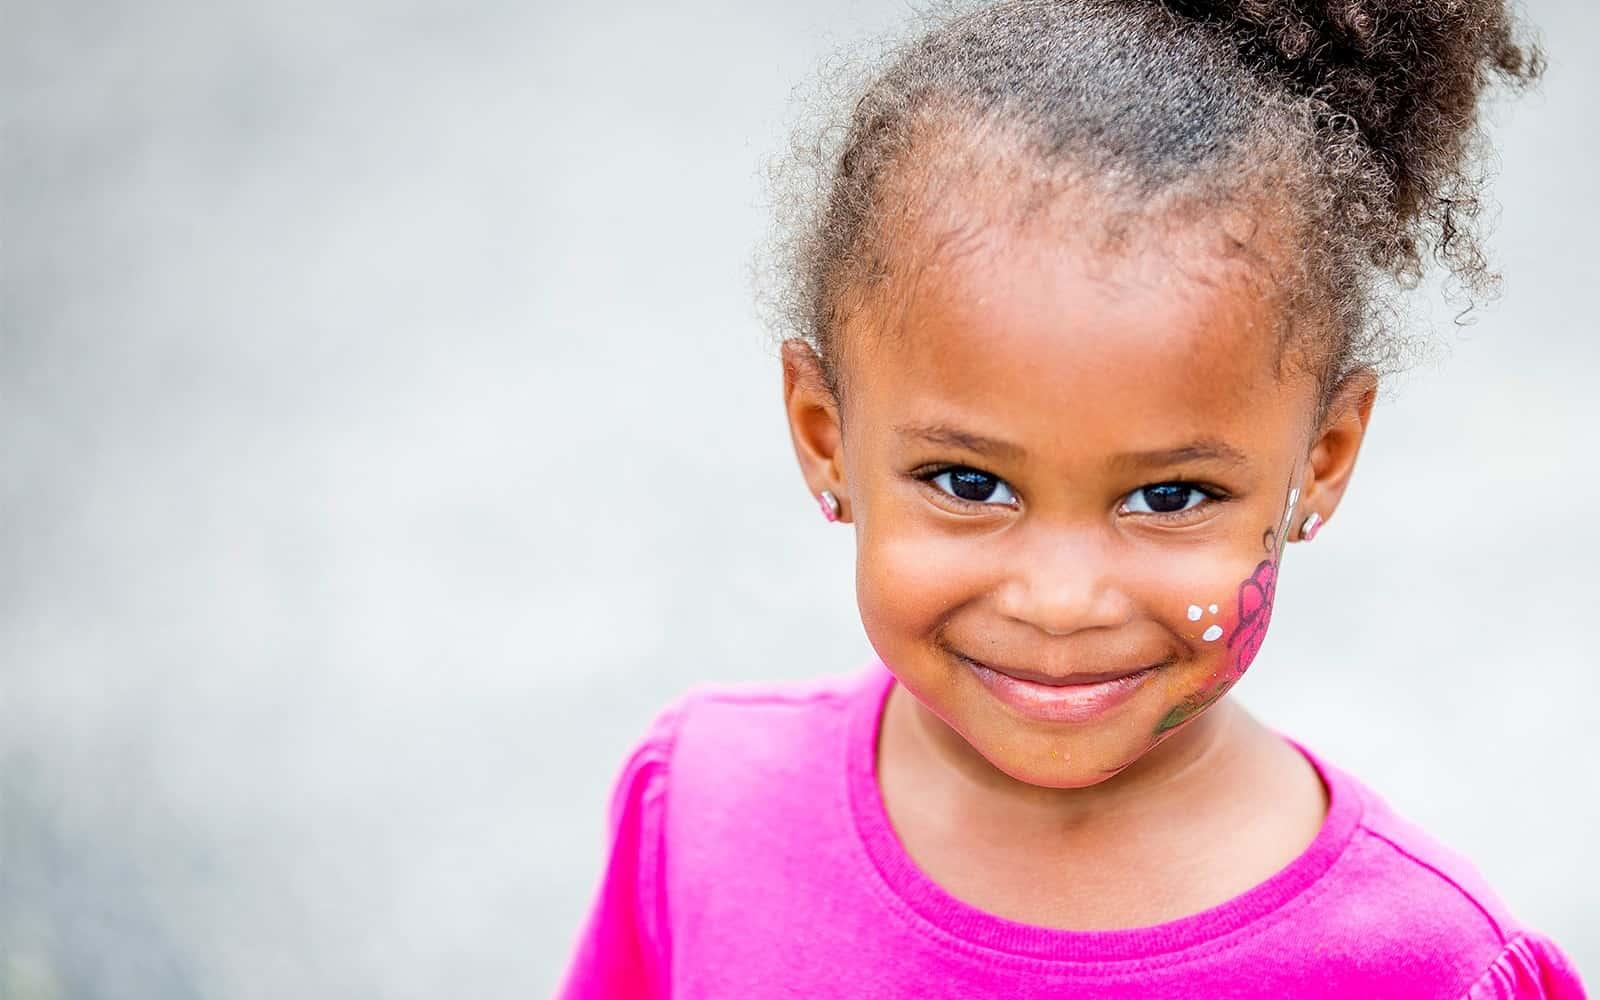 Little girl with facepaint on cheek